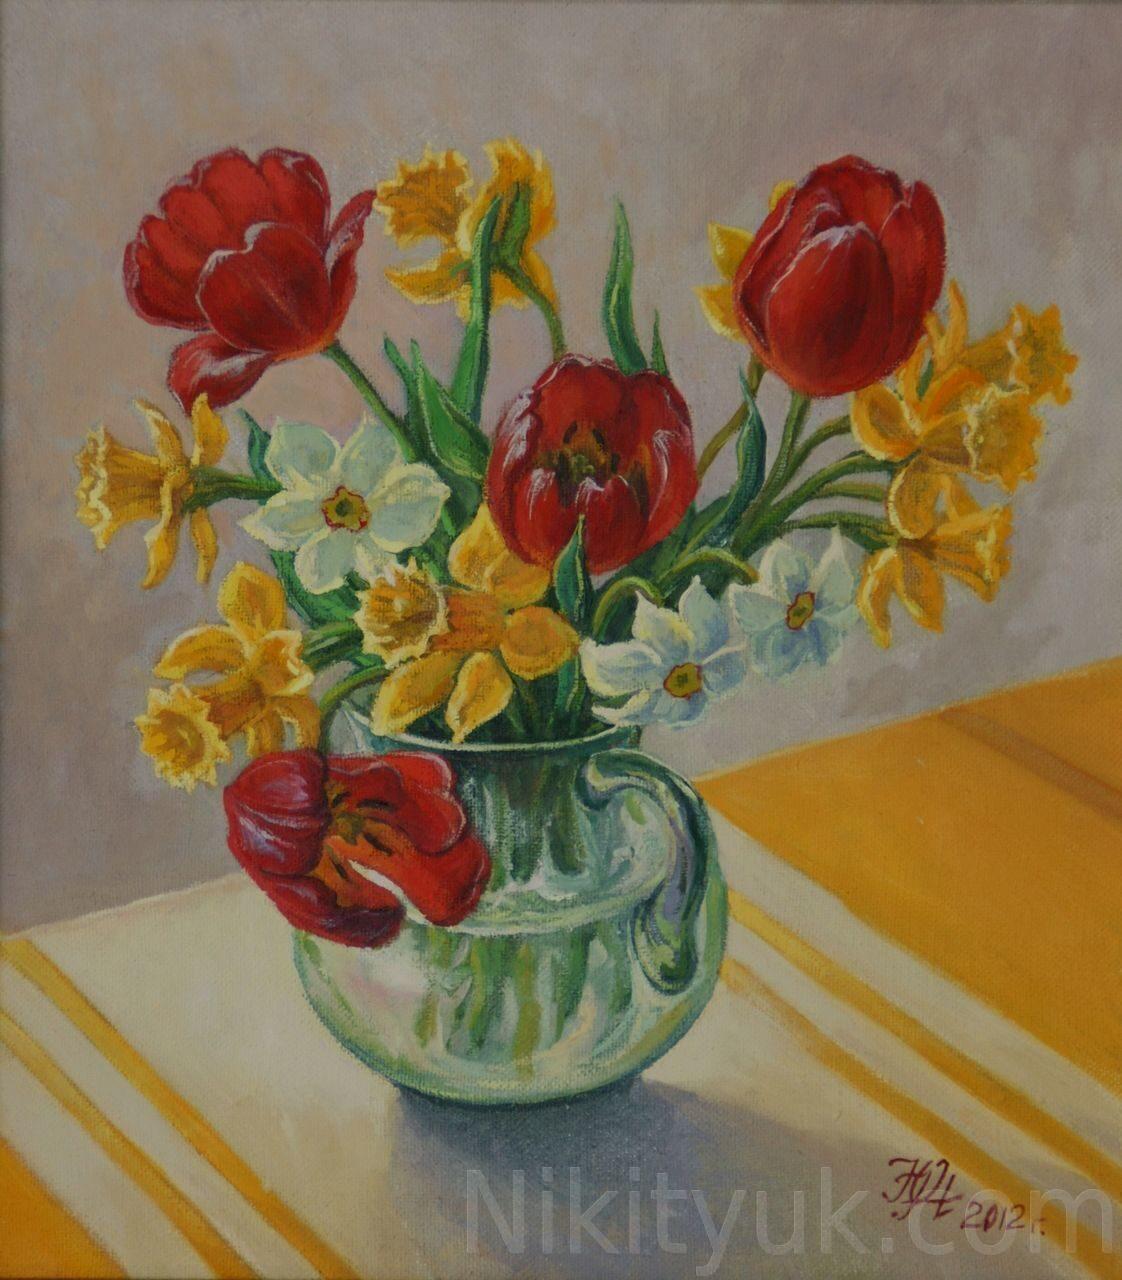 Нарциссы и тюльпаны, х.м., 50х40см, 2006г. 8 000 руб., в наличии